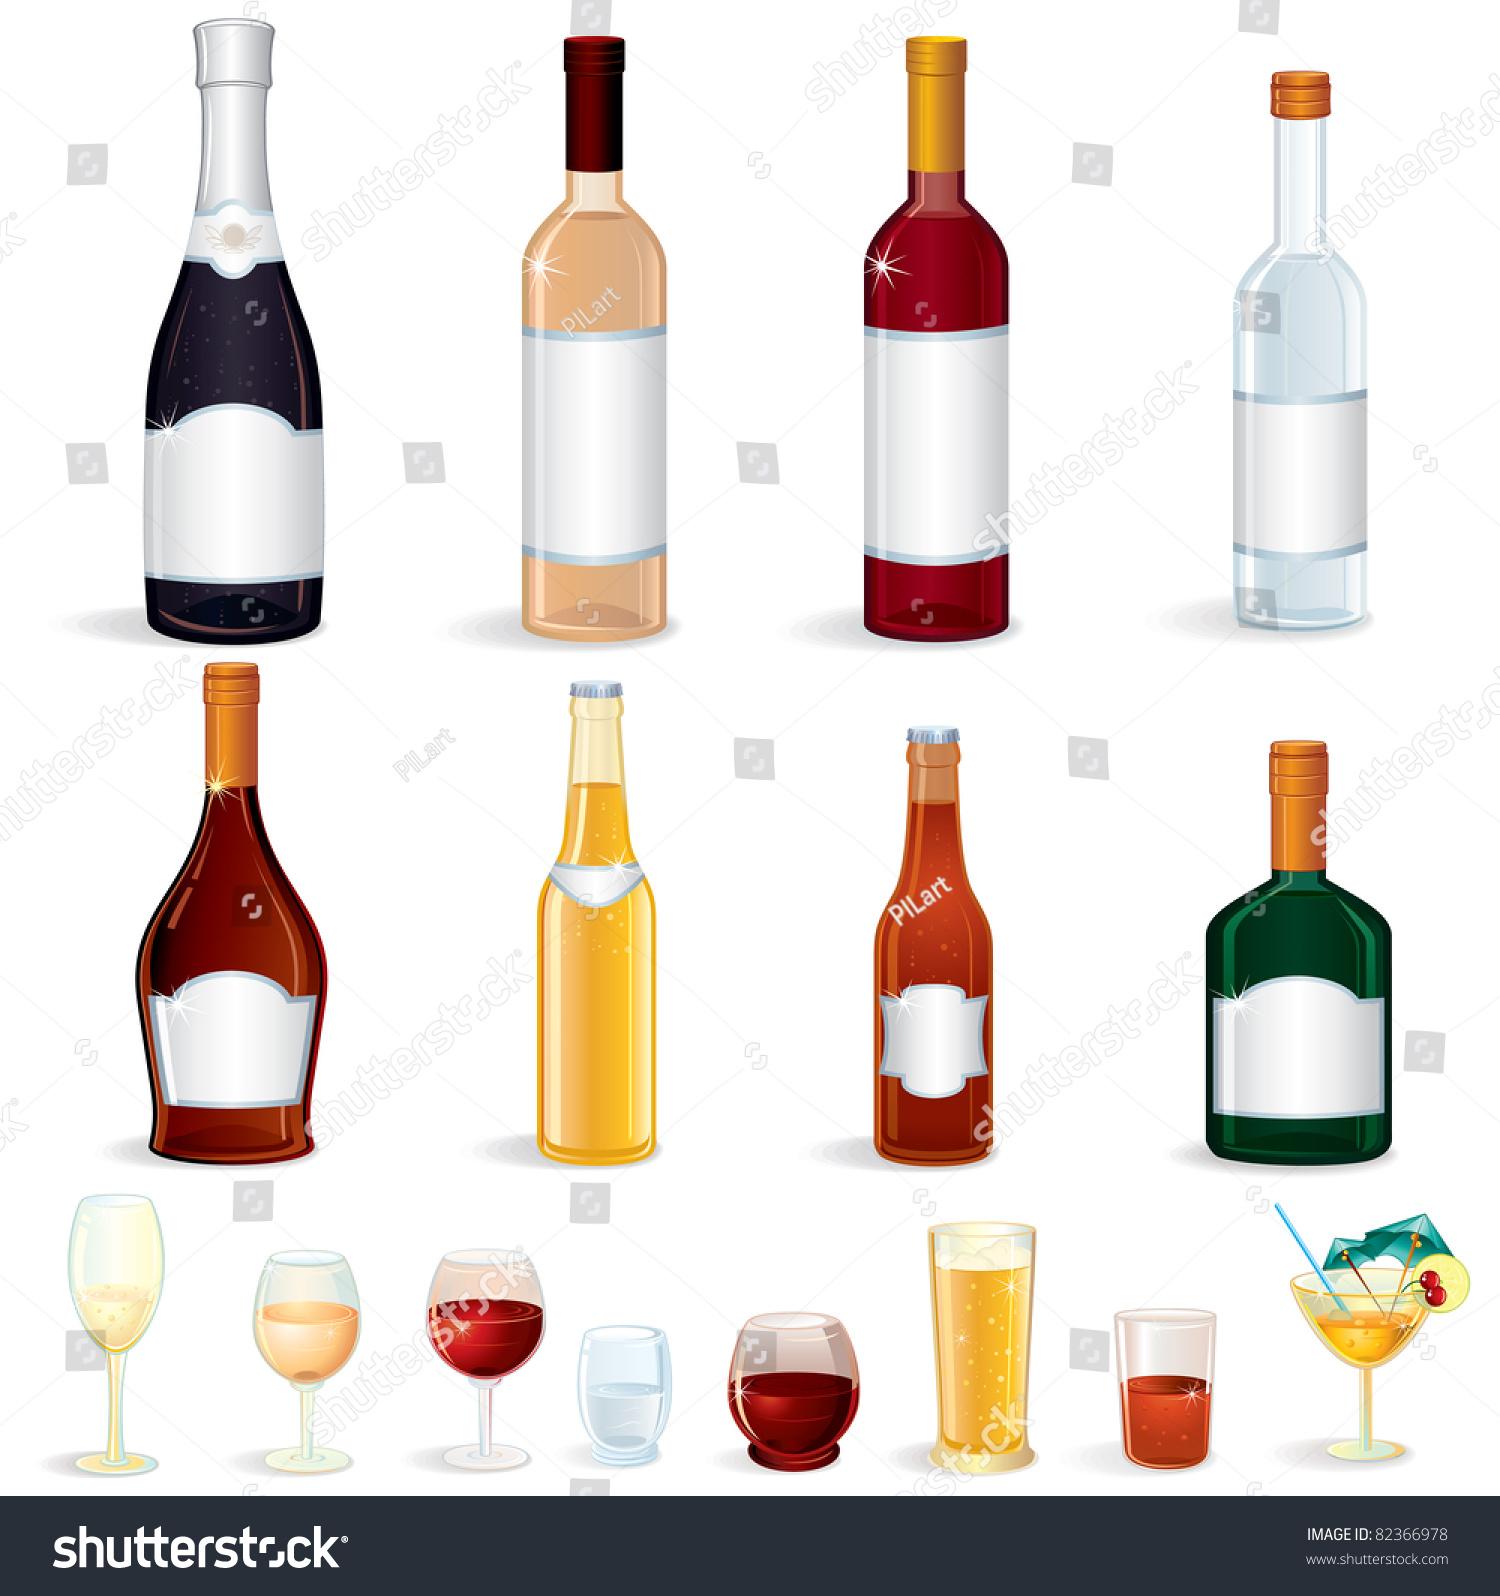 Different Glass Bottles Alcoholic Drinks Vector Stock Vector ...